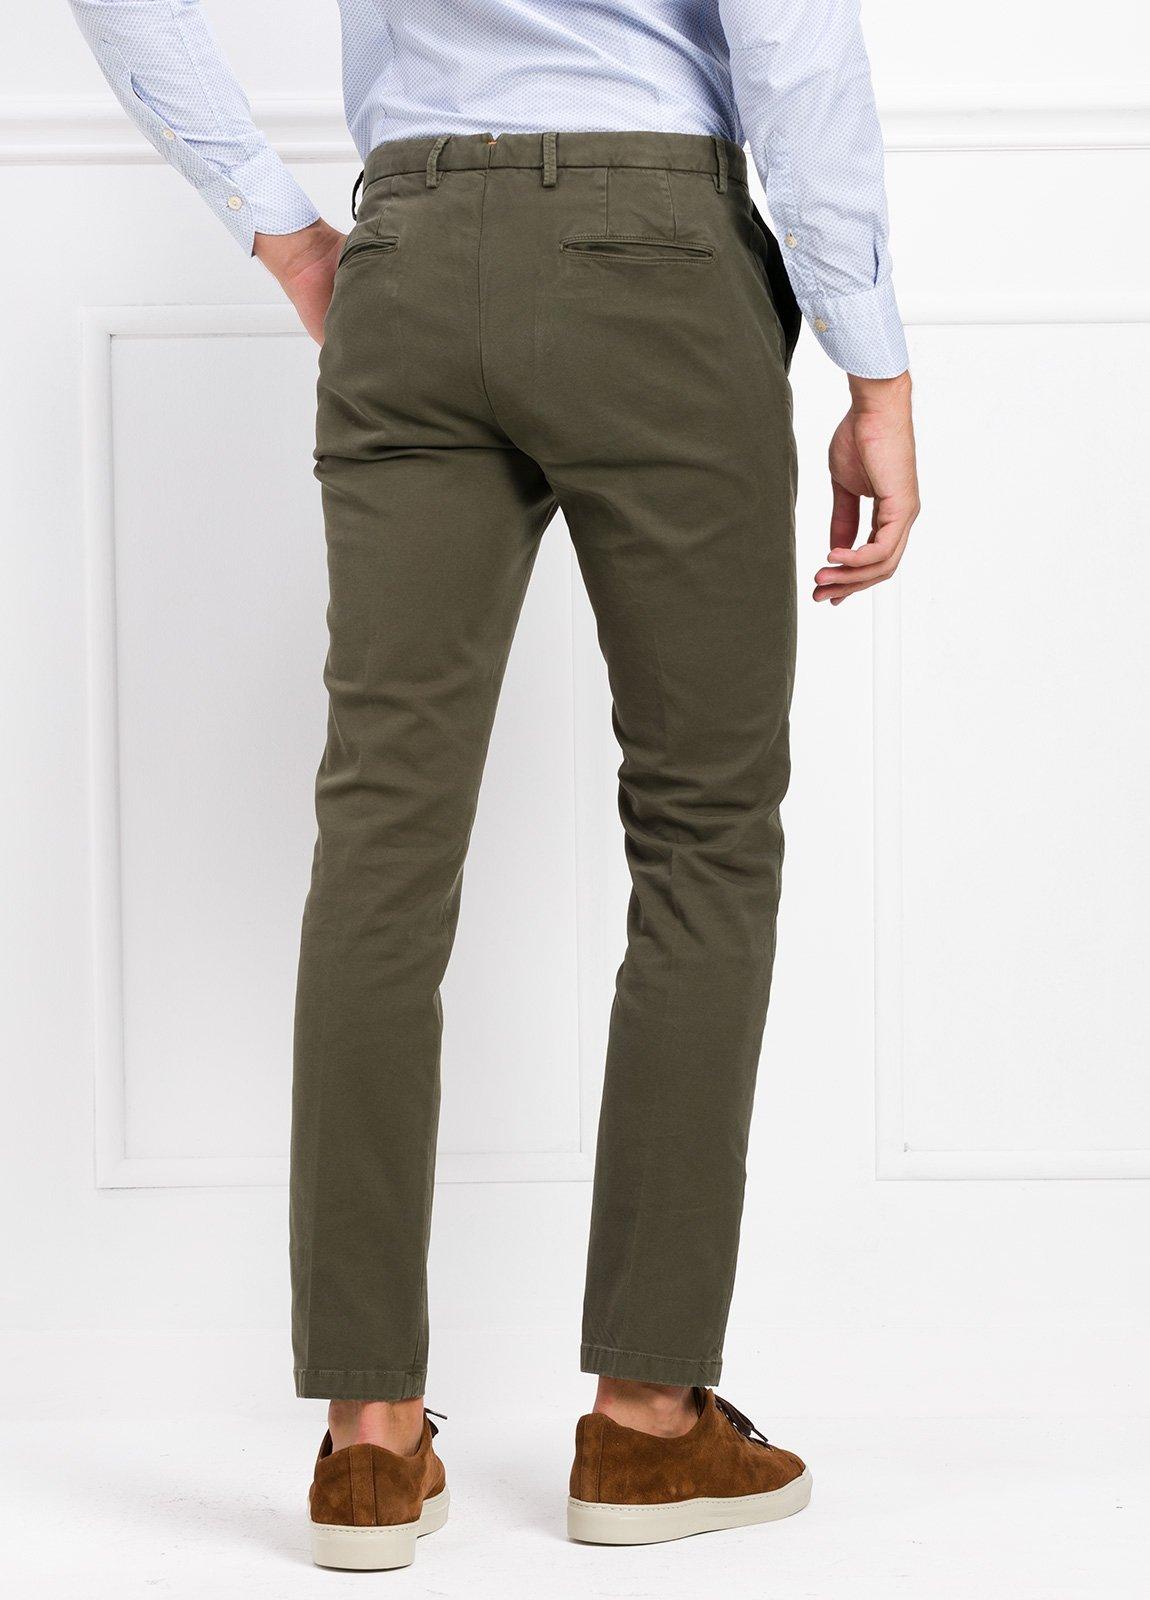 Pantalón modelo slim fit color verde kaki. 97% Algodón 3% Ea. - Ítem1